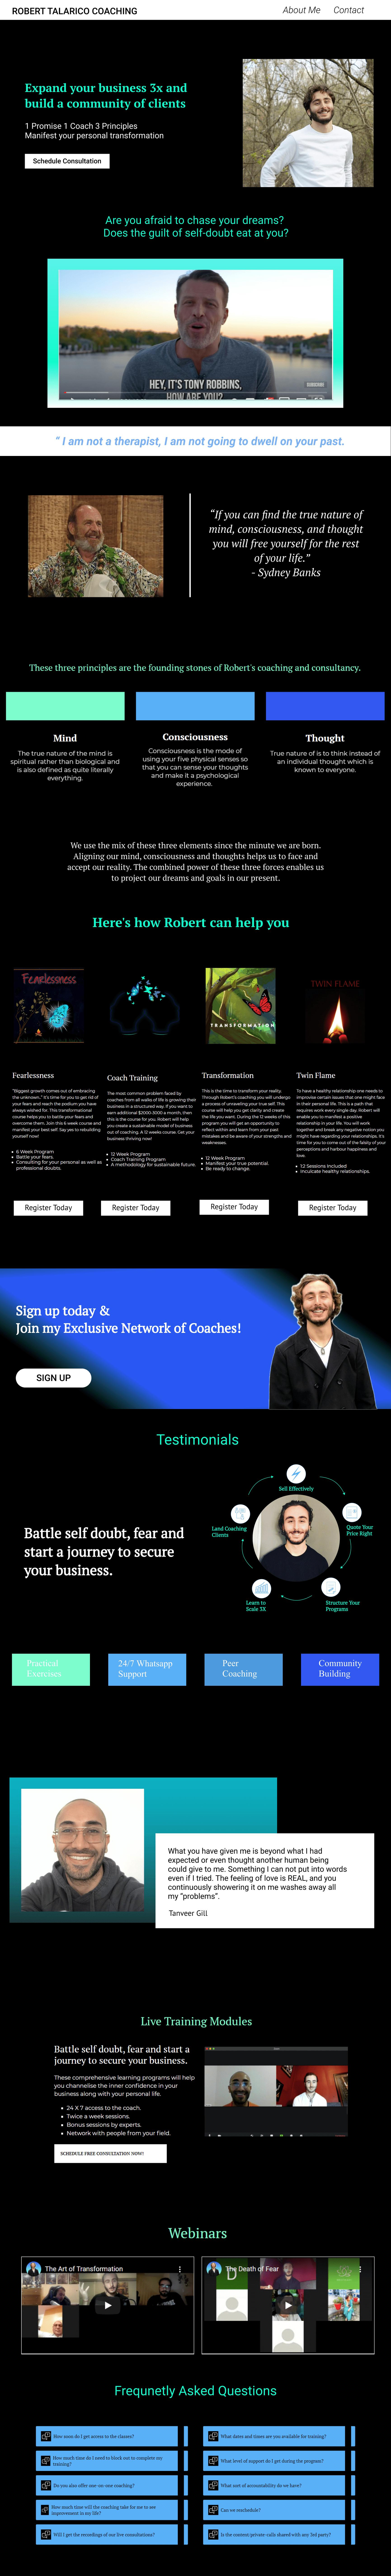 Robert Talarico Website Wireframe by MOSTLI.